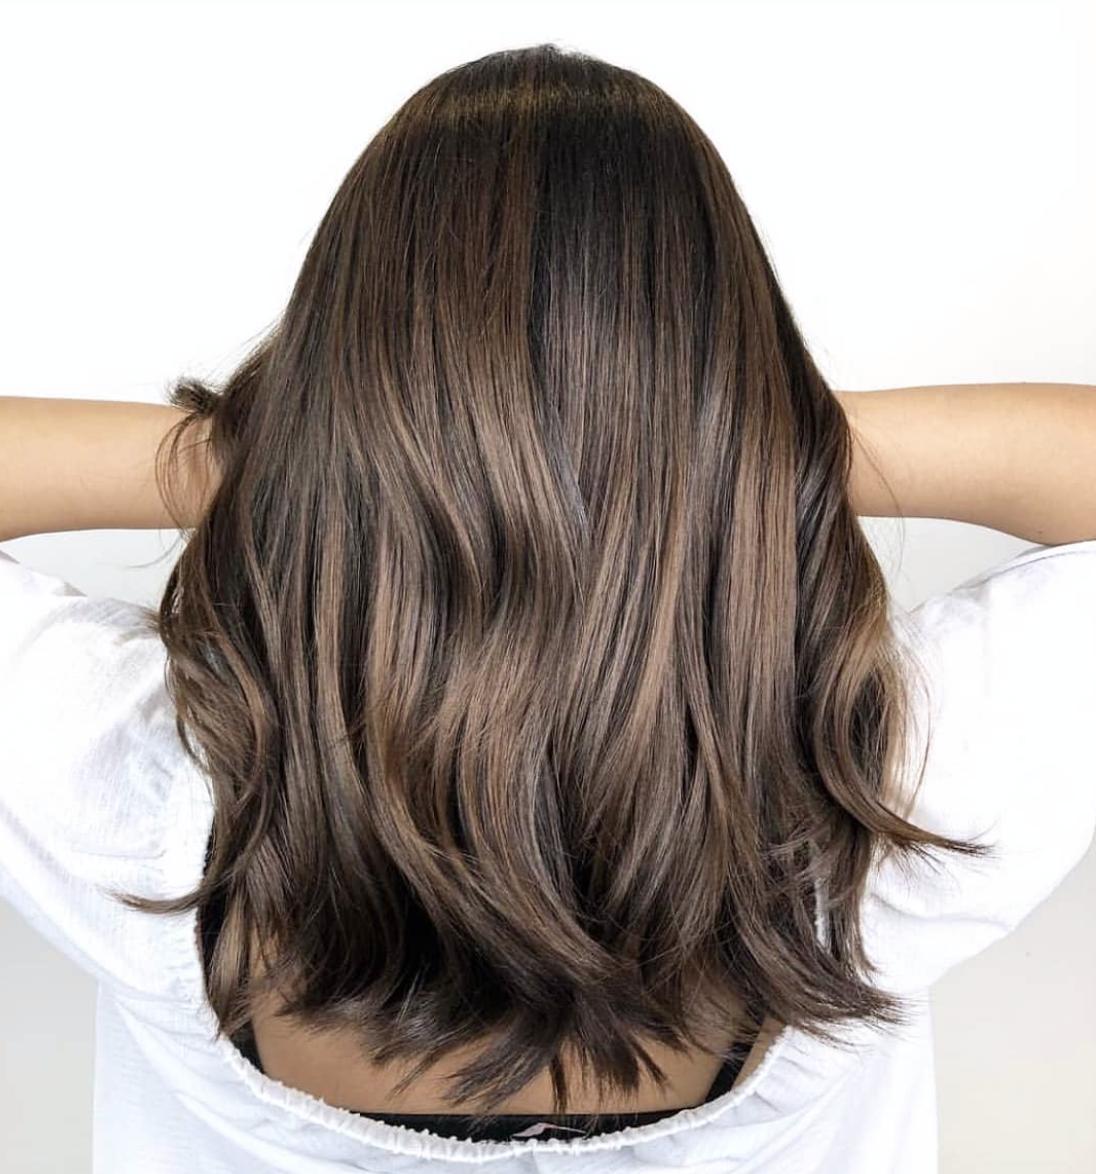 After Care Setelah Melakukan Permanent Blow Dry Hair Care Alora Hair Beauty Spa Beauty Is A Choice